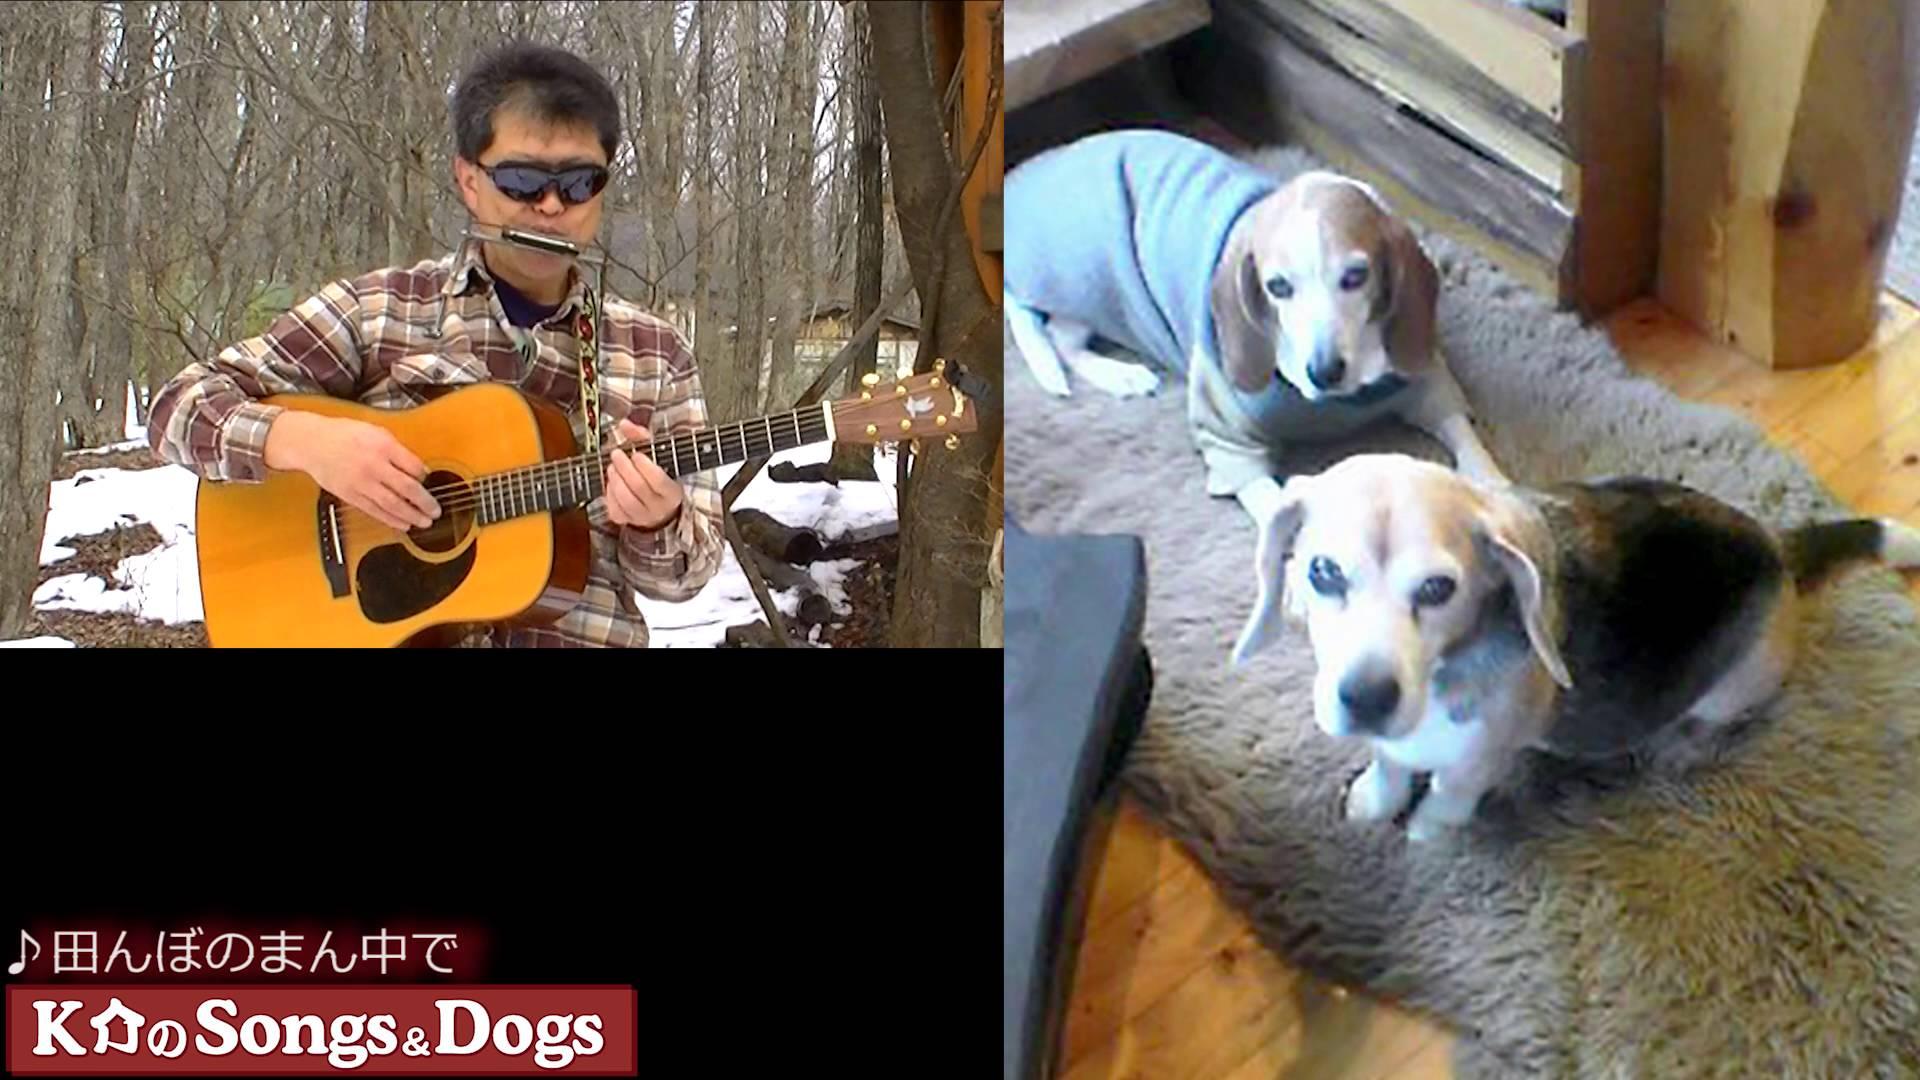 108th: K介のSongs&Dogs週末はミュージシャン